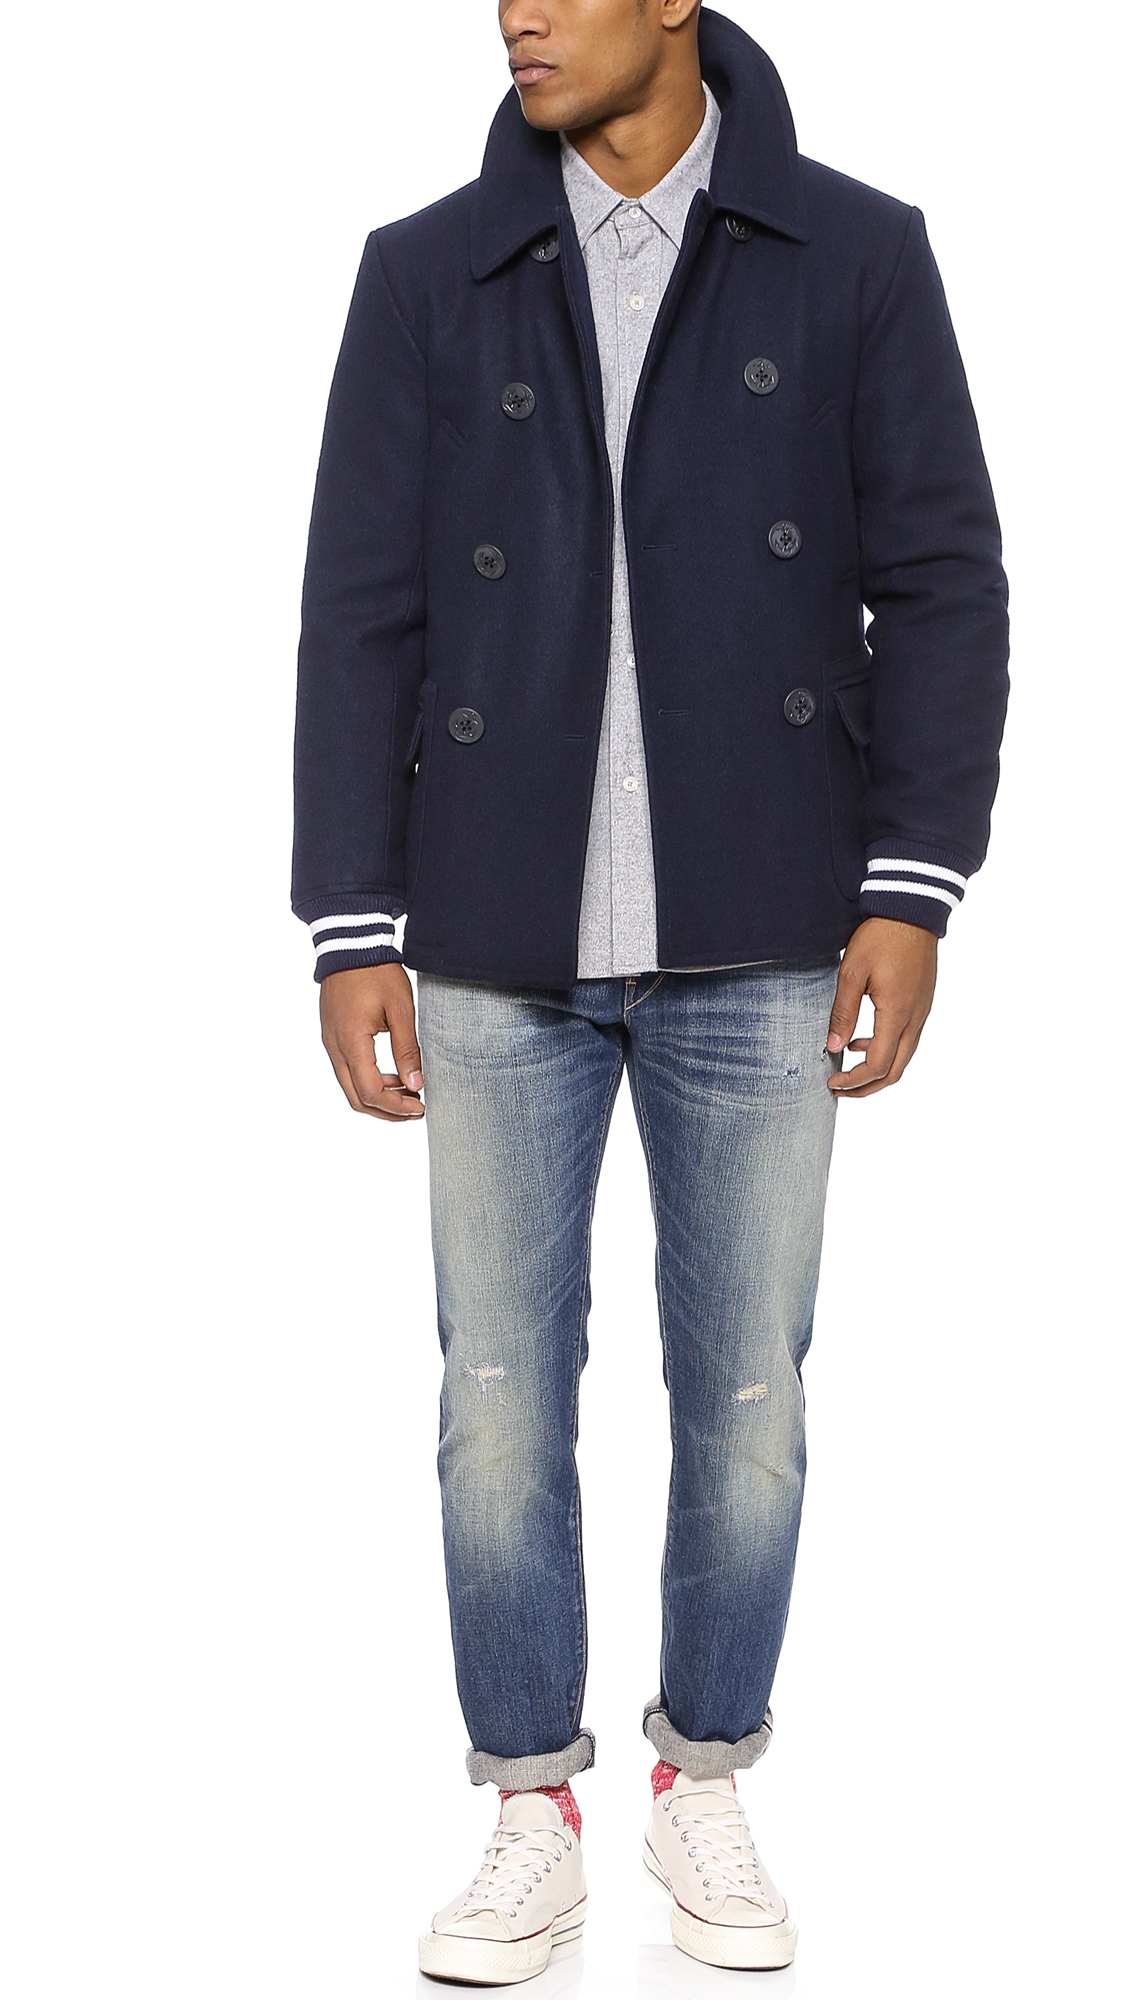 93406ade403 Woolrich woolen mills blue varsity pea coat product normal jpg 1128x2000 Woolrich  dock coat